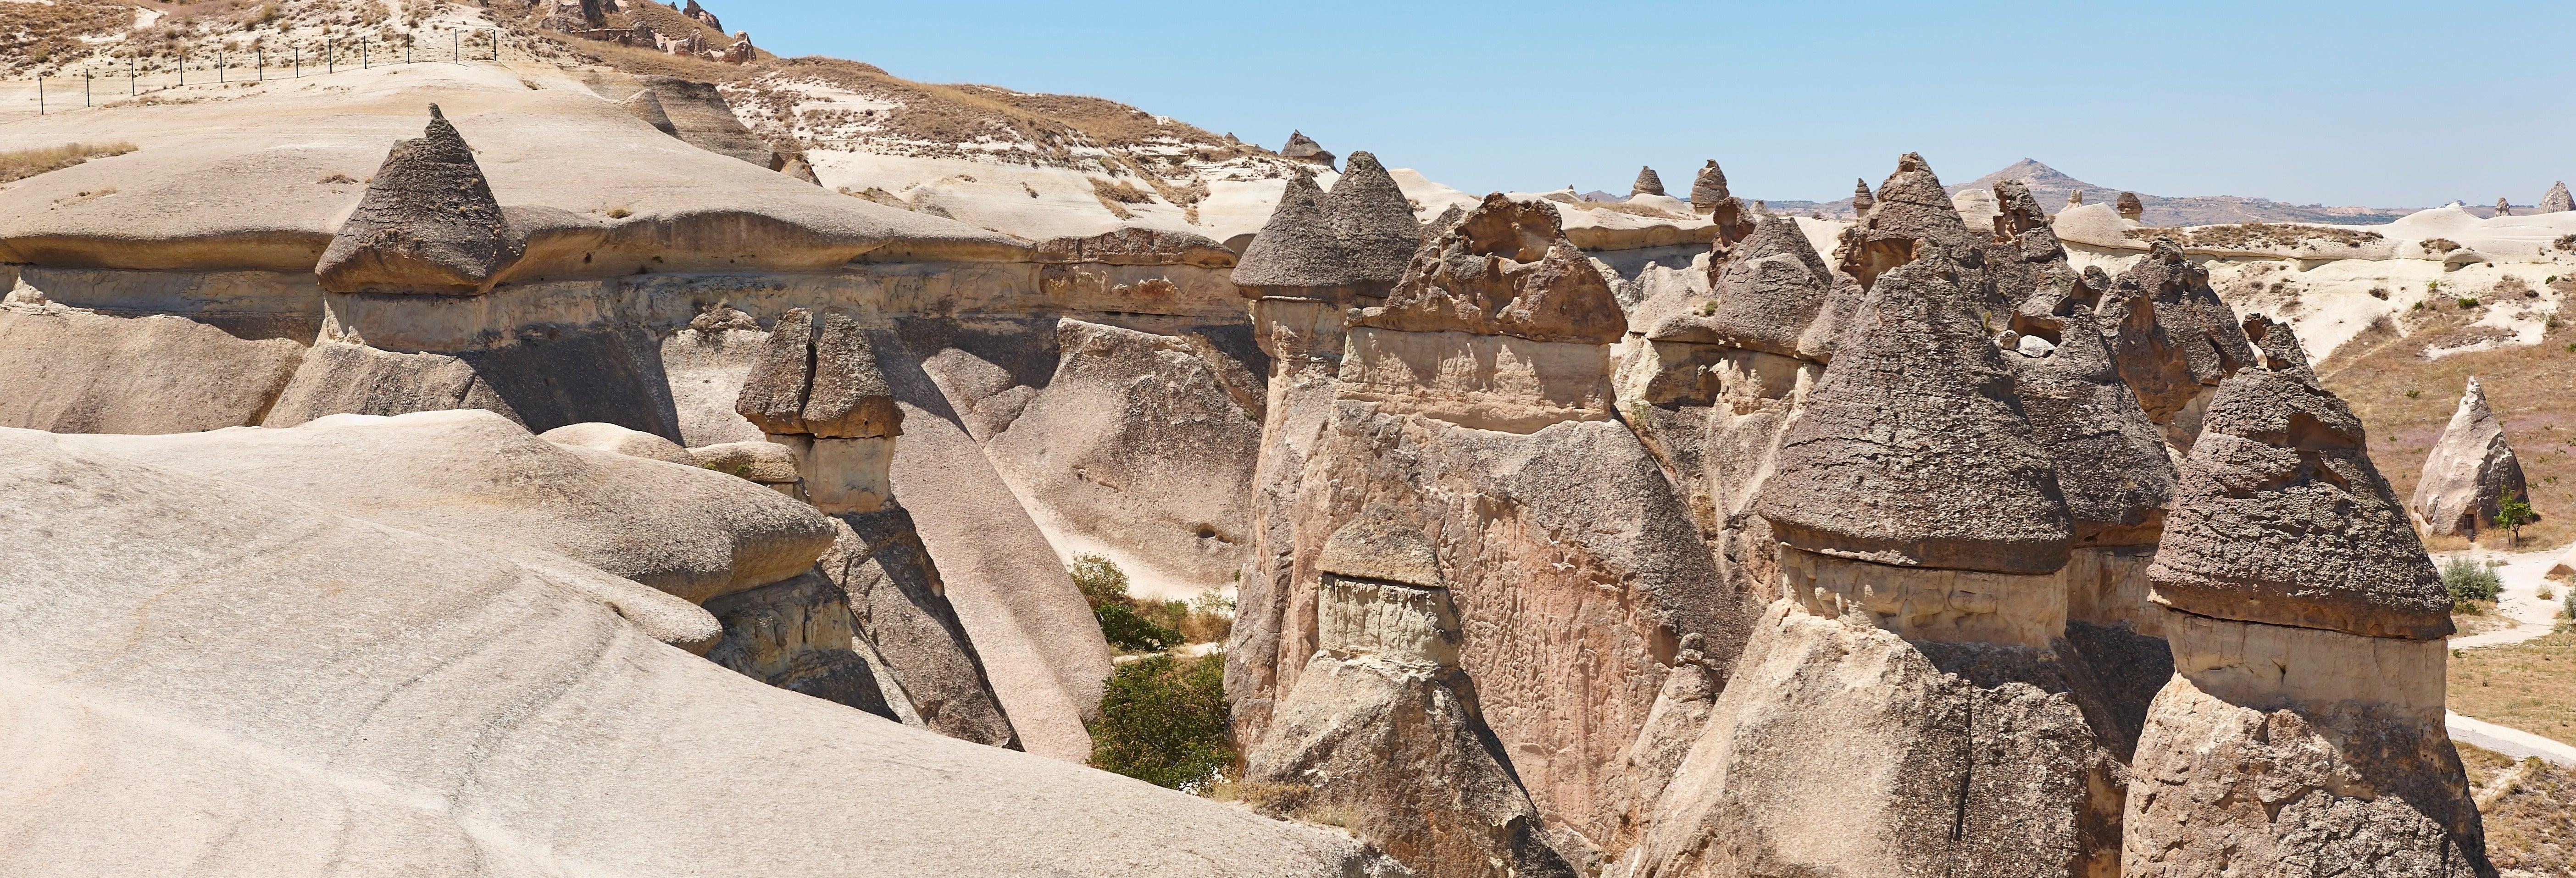 Excursion dans le nord de la Cappadoce